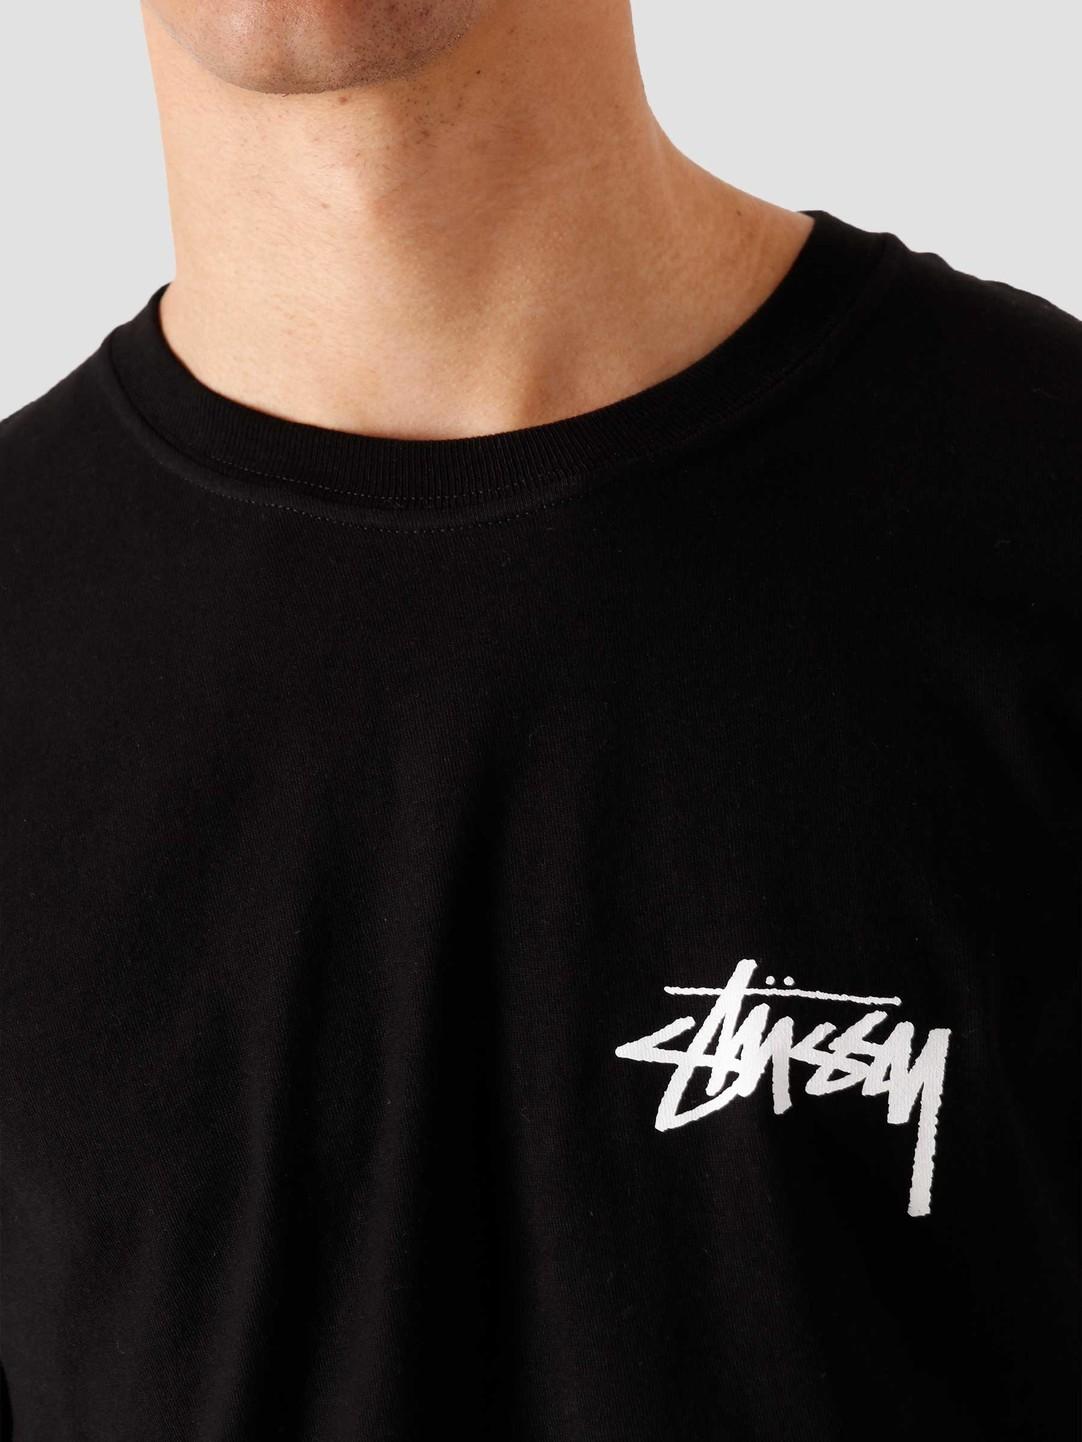 Stussy Stussy Peace Sign T-Shirt Black 1904662-0001